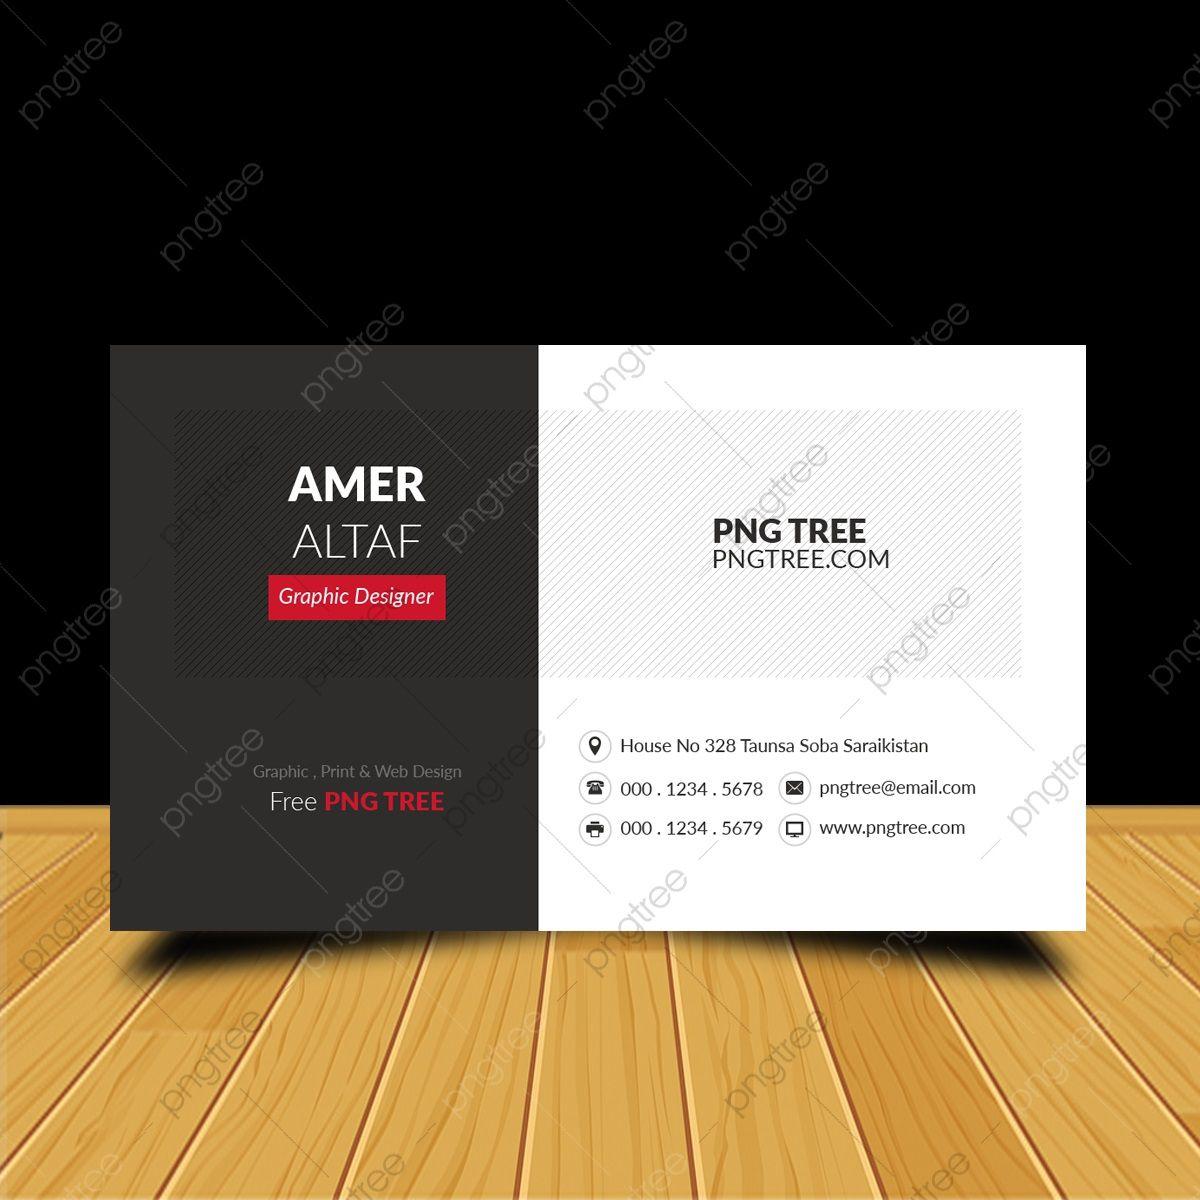 008 Sensational Simple Visiting Card Design Psd File Free Download Highest Quality Full